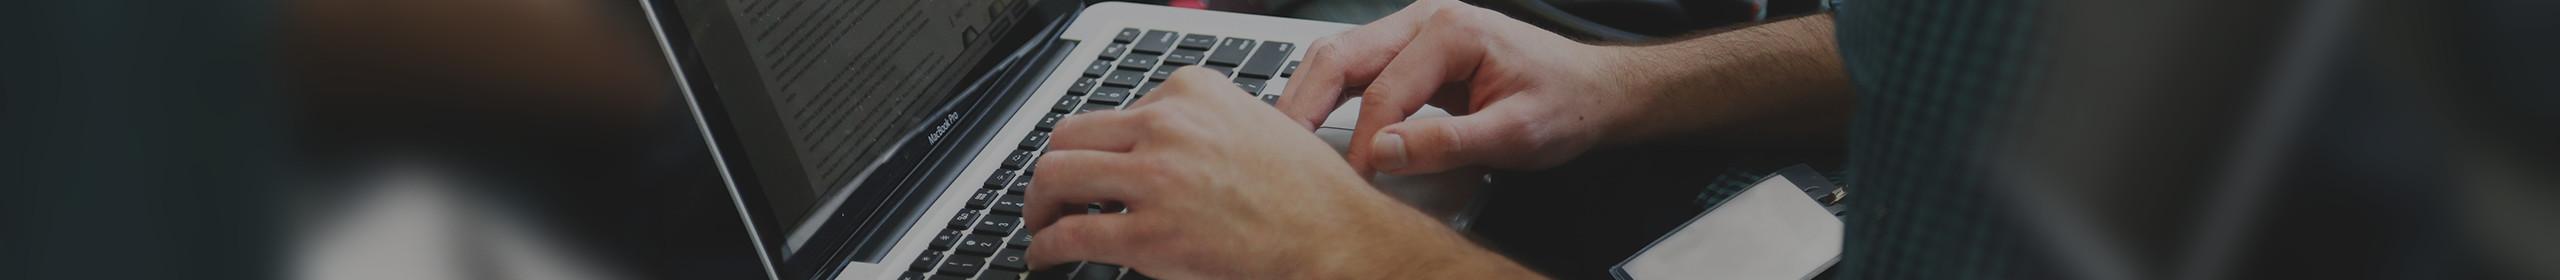 laptop sitting on knees writing a blog